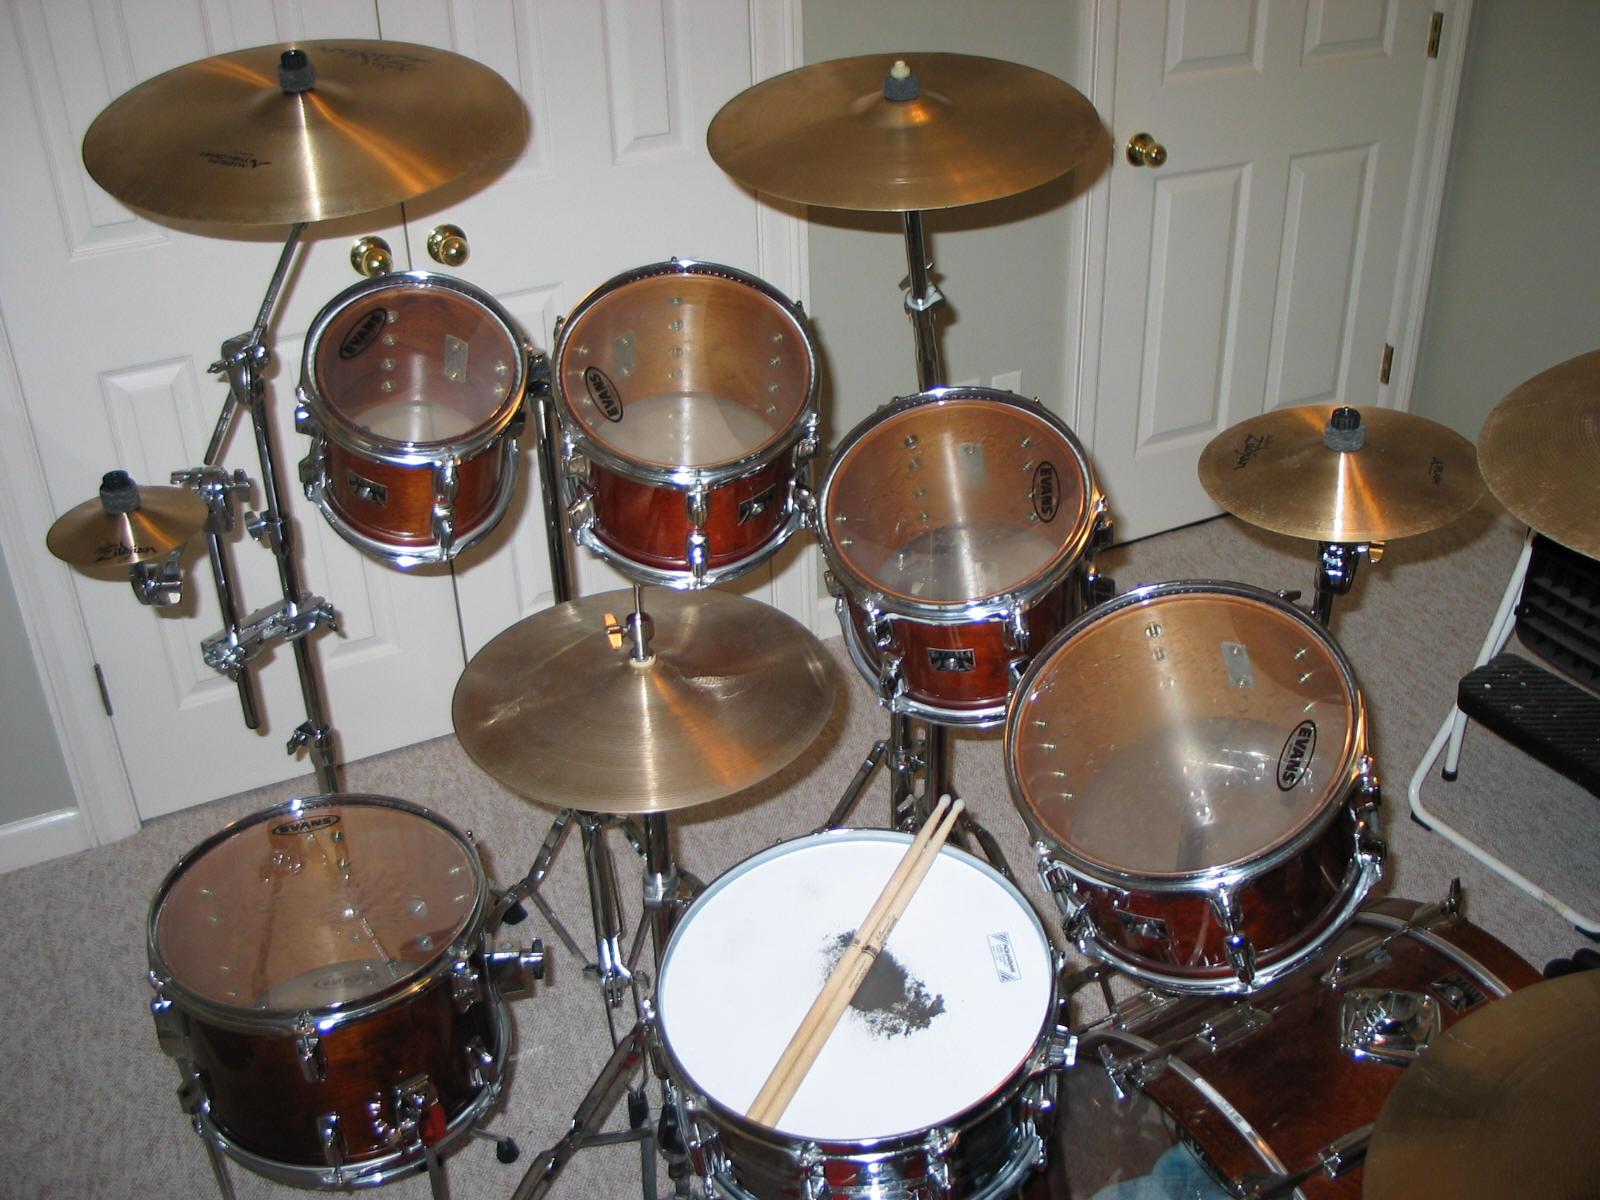 shane wallace 39 s drums. Black Bedroom Furniture Sets. Home Design Ideas